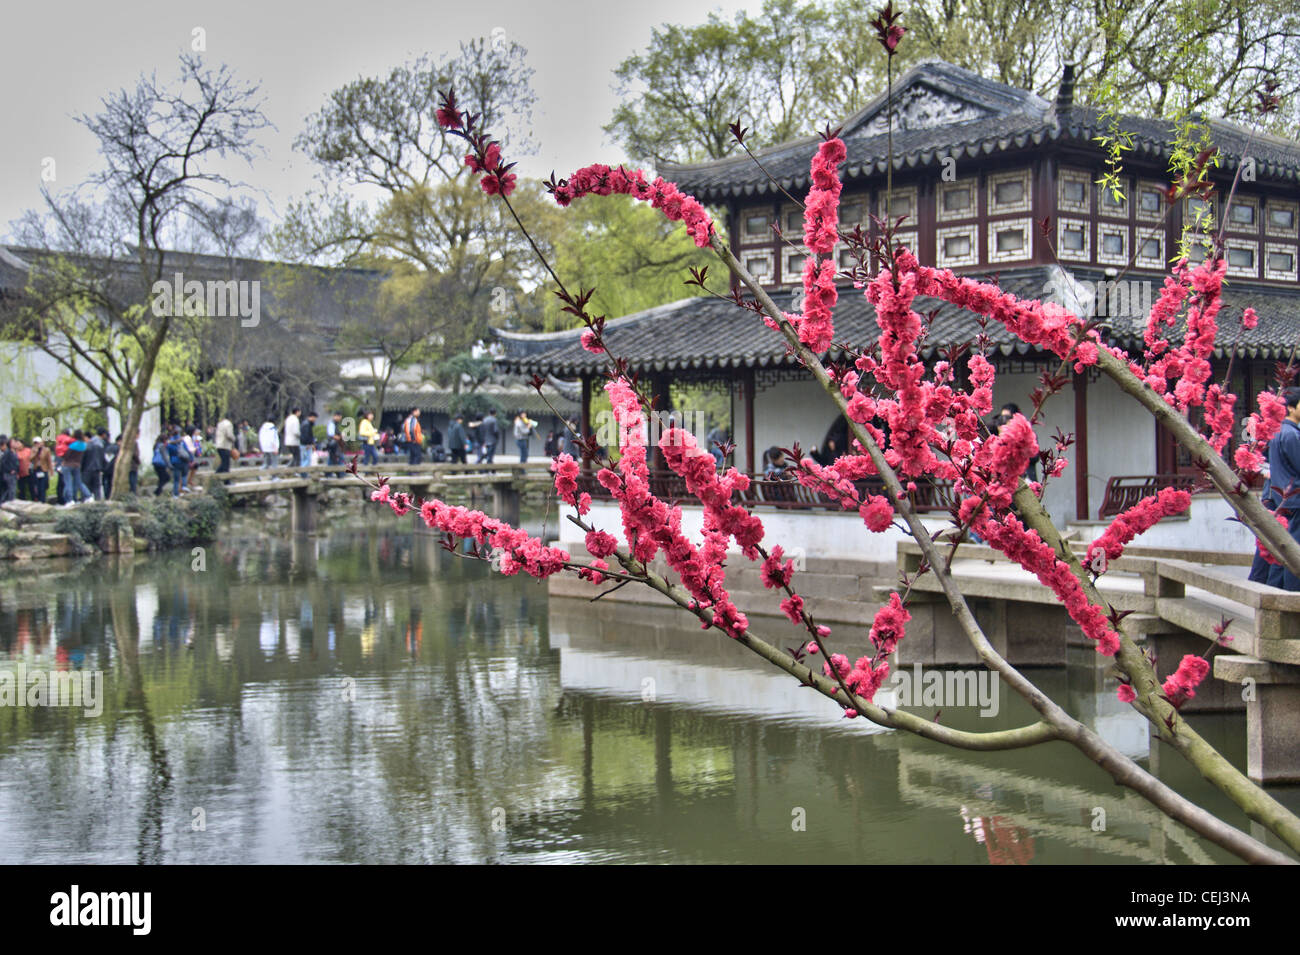 Pond and pagoda at Humble administrator's garden - Suzhou (china) - Stock Image